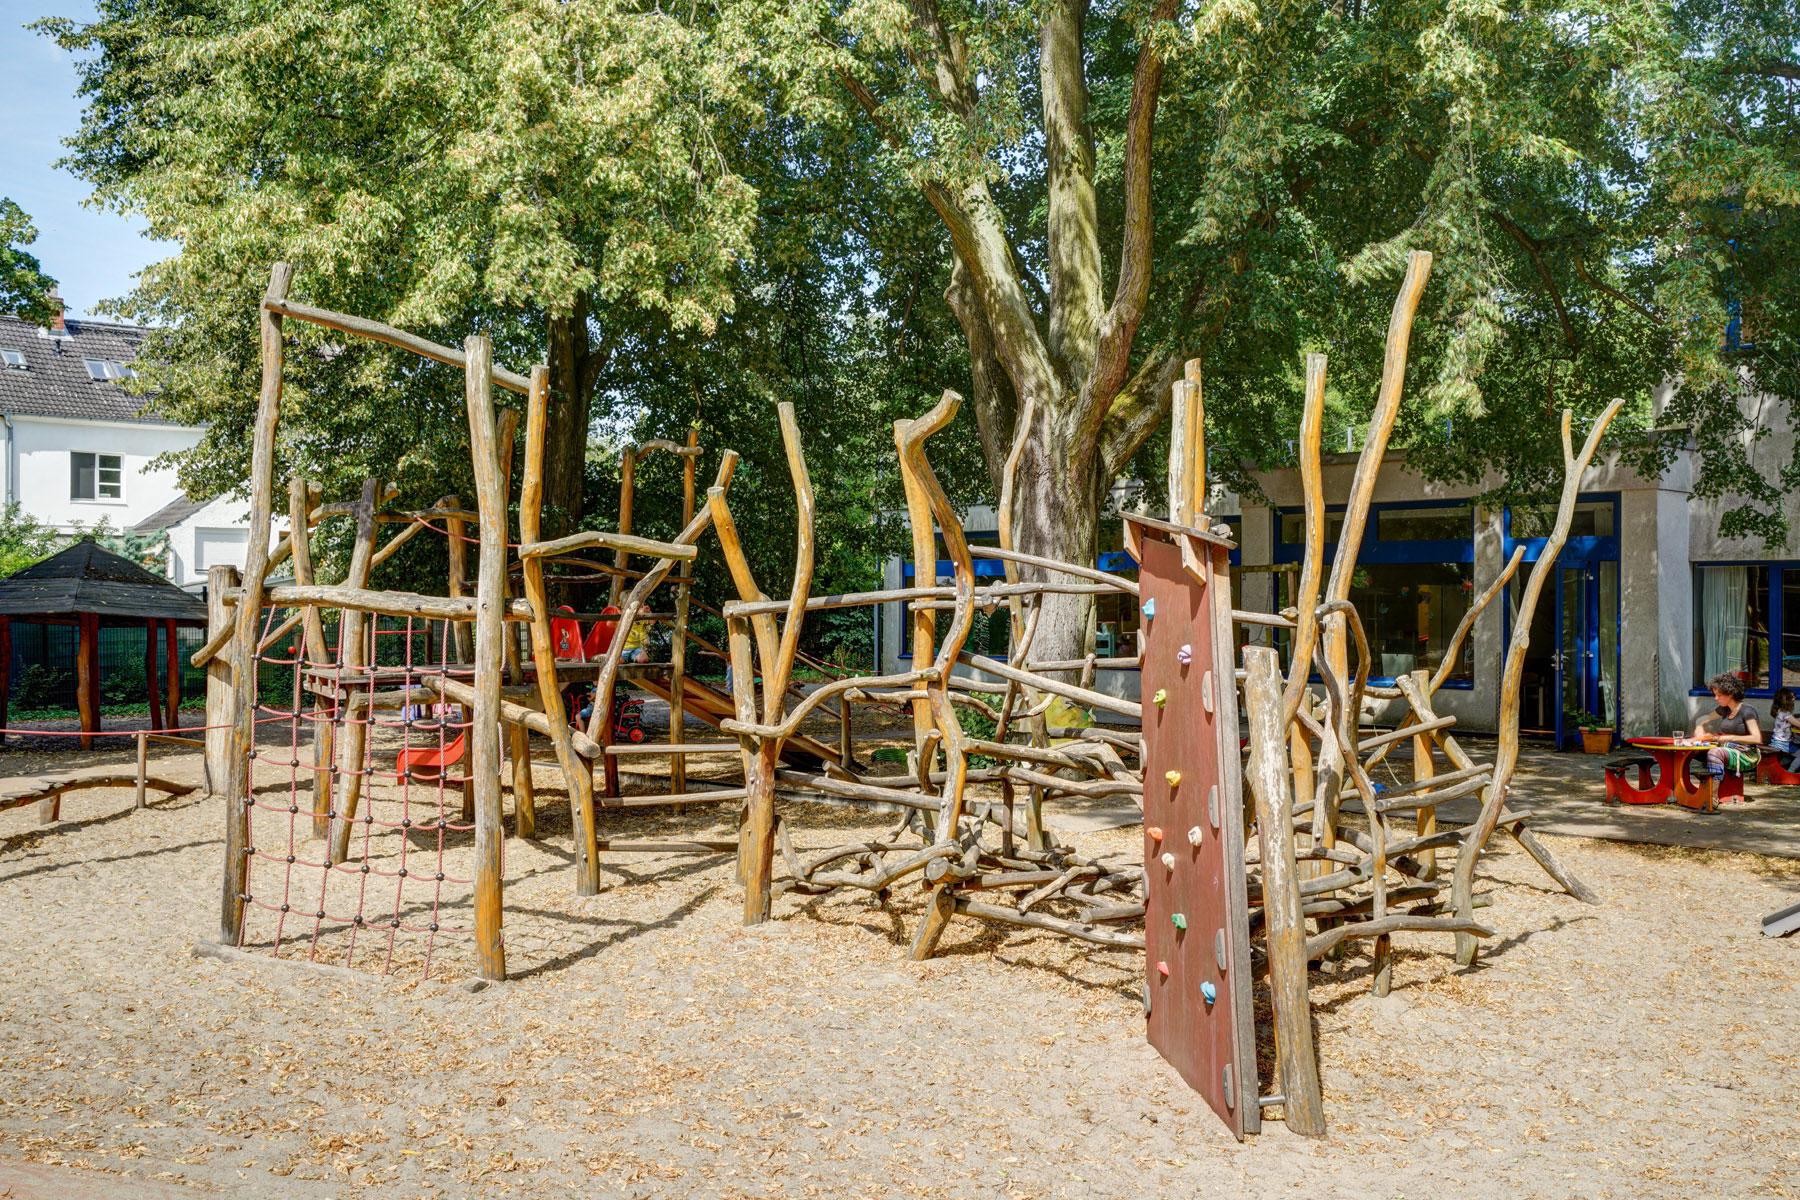 Outdoor Küche Kindergarten : Www.kirchenkreis steglitz.de kita petrusheim